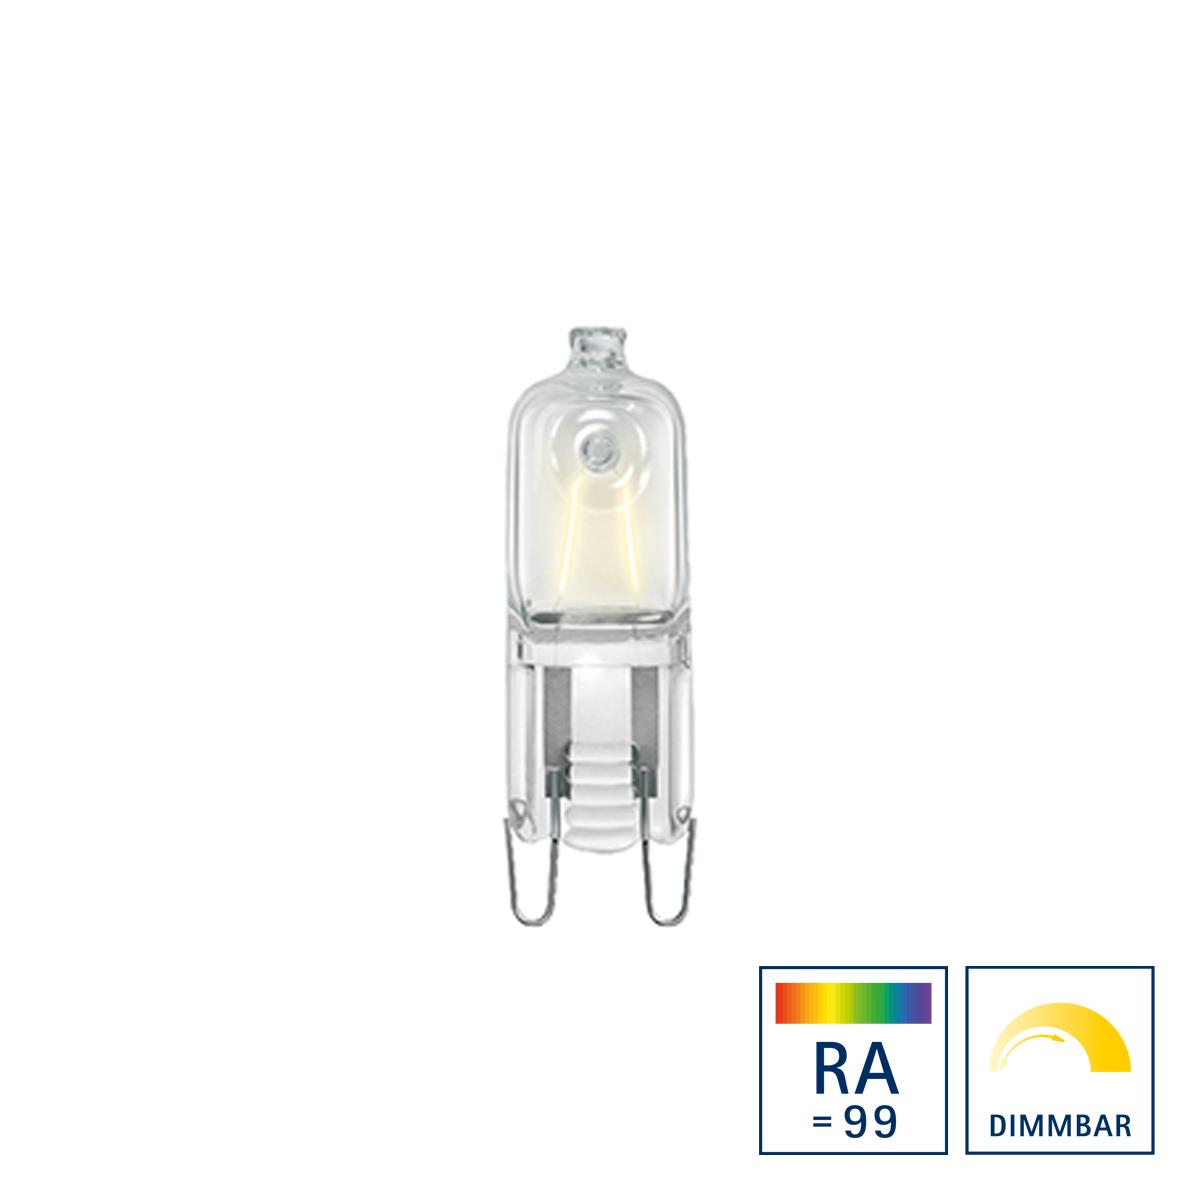 Sigor Halogenlampe 230 V G9, 20 W